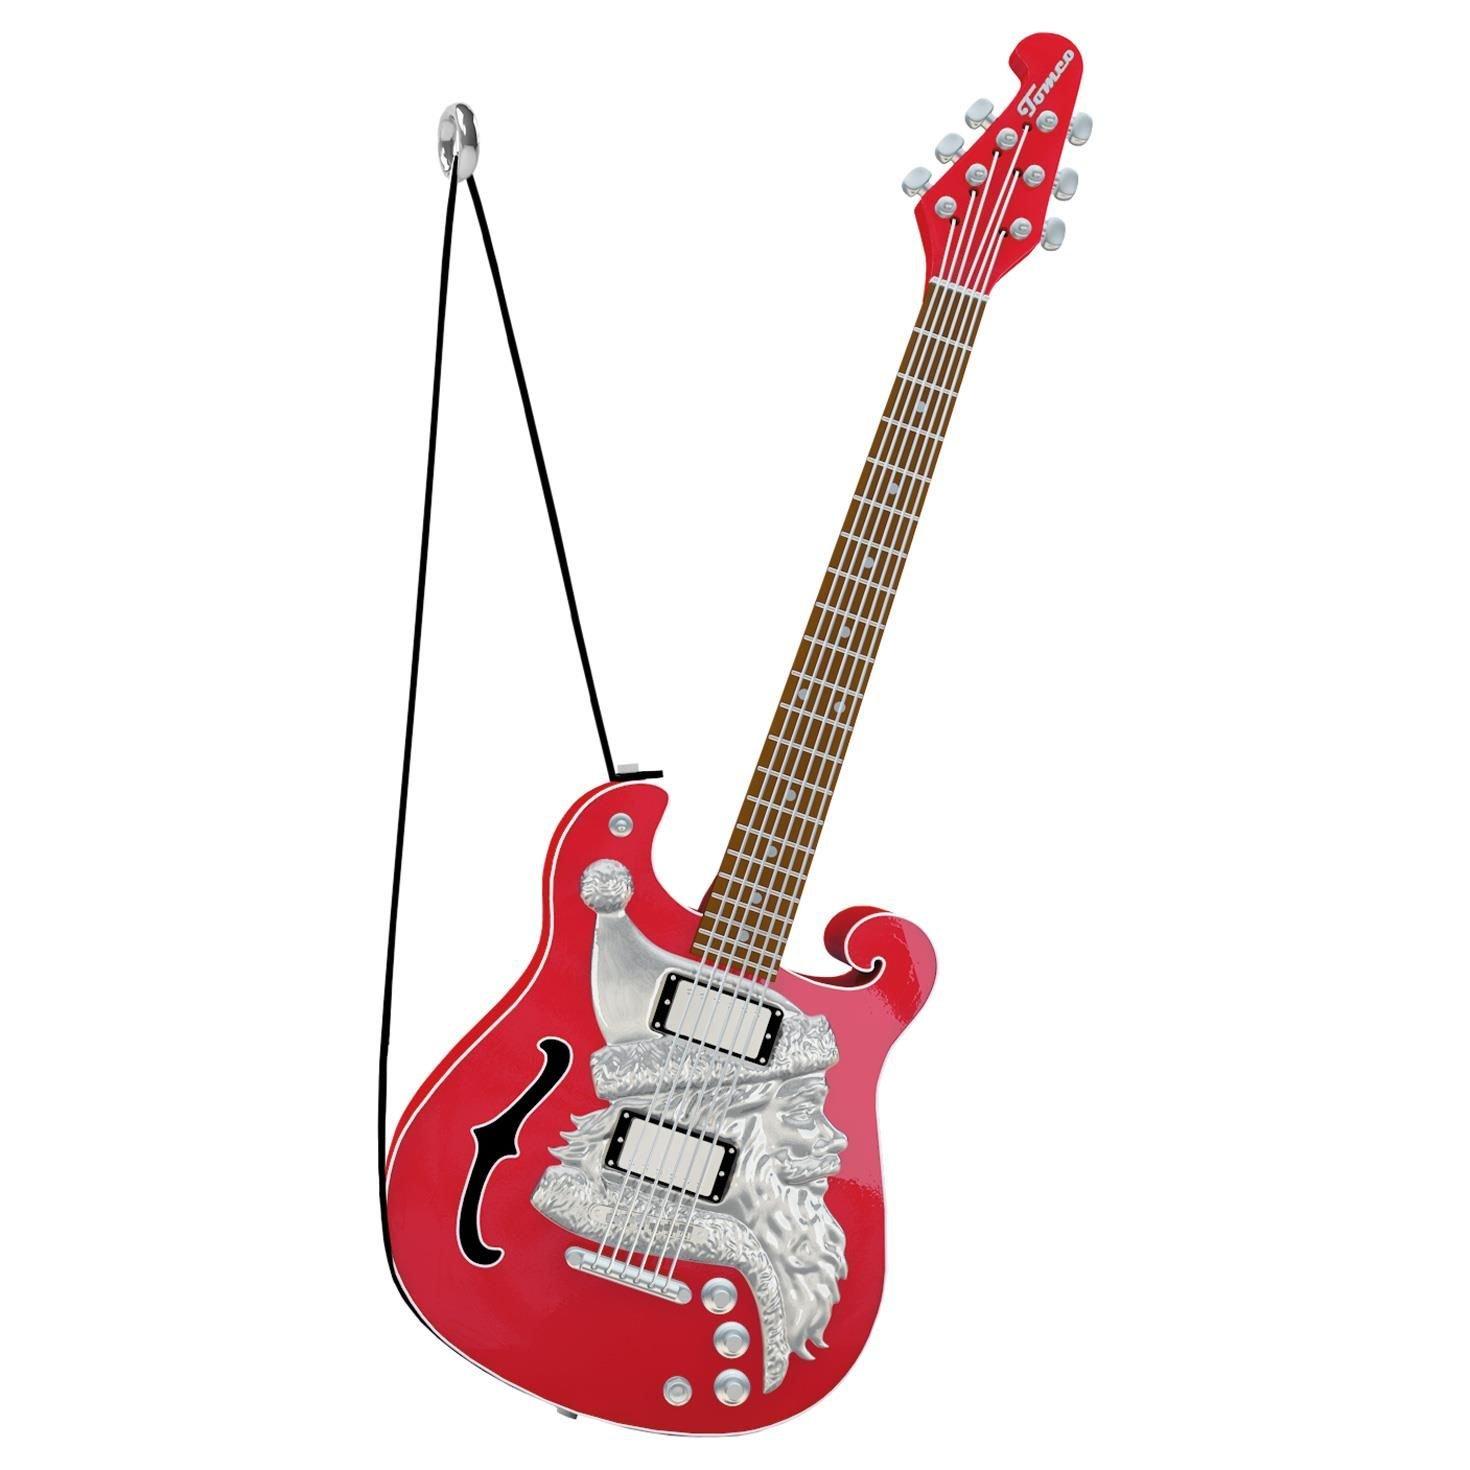 Hallmark Keepsake 2017 Santa Claus Is Comin' to Town Guitar Musical Christmas Ornament